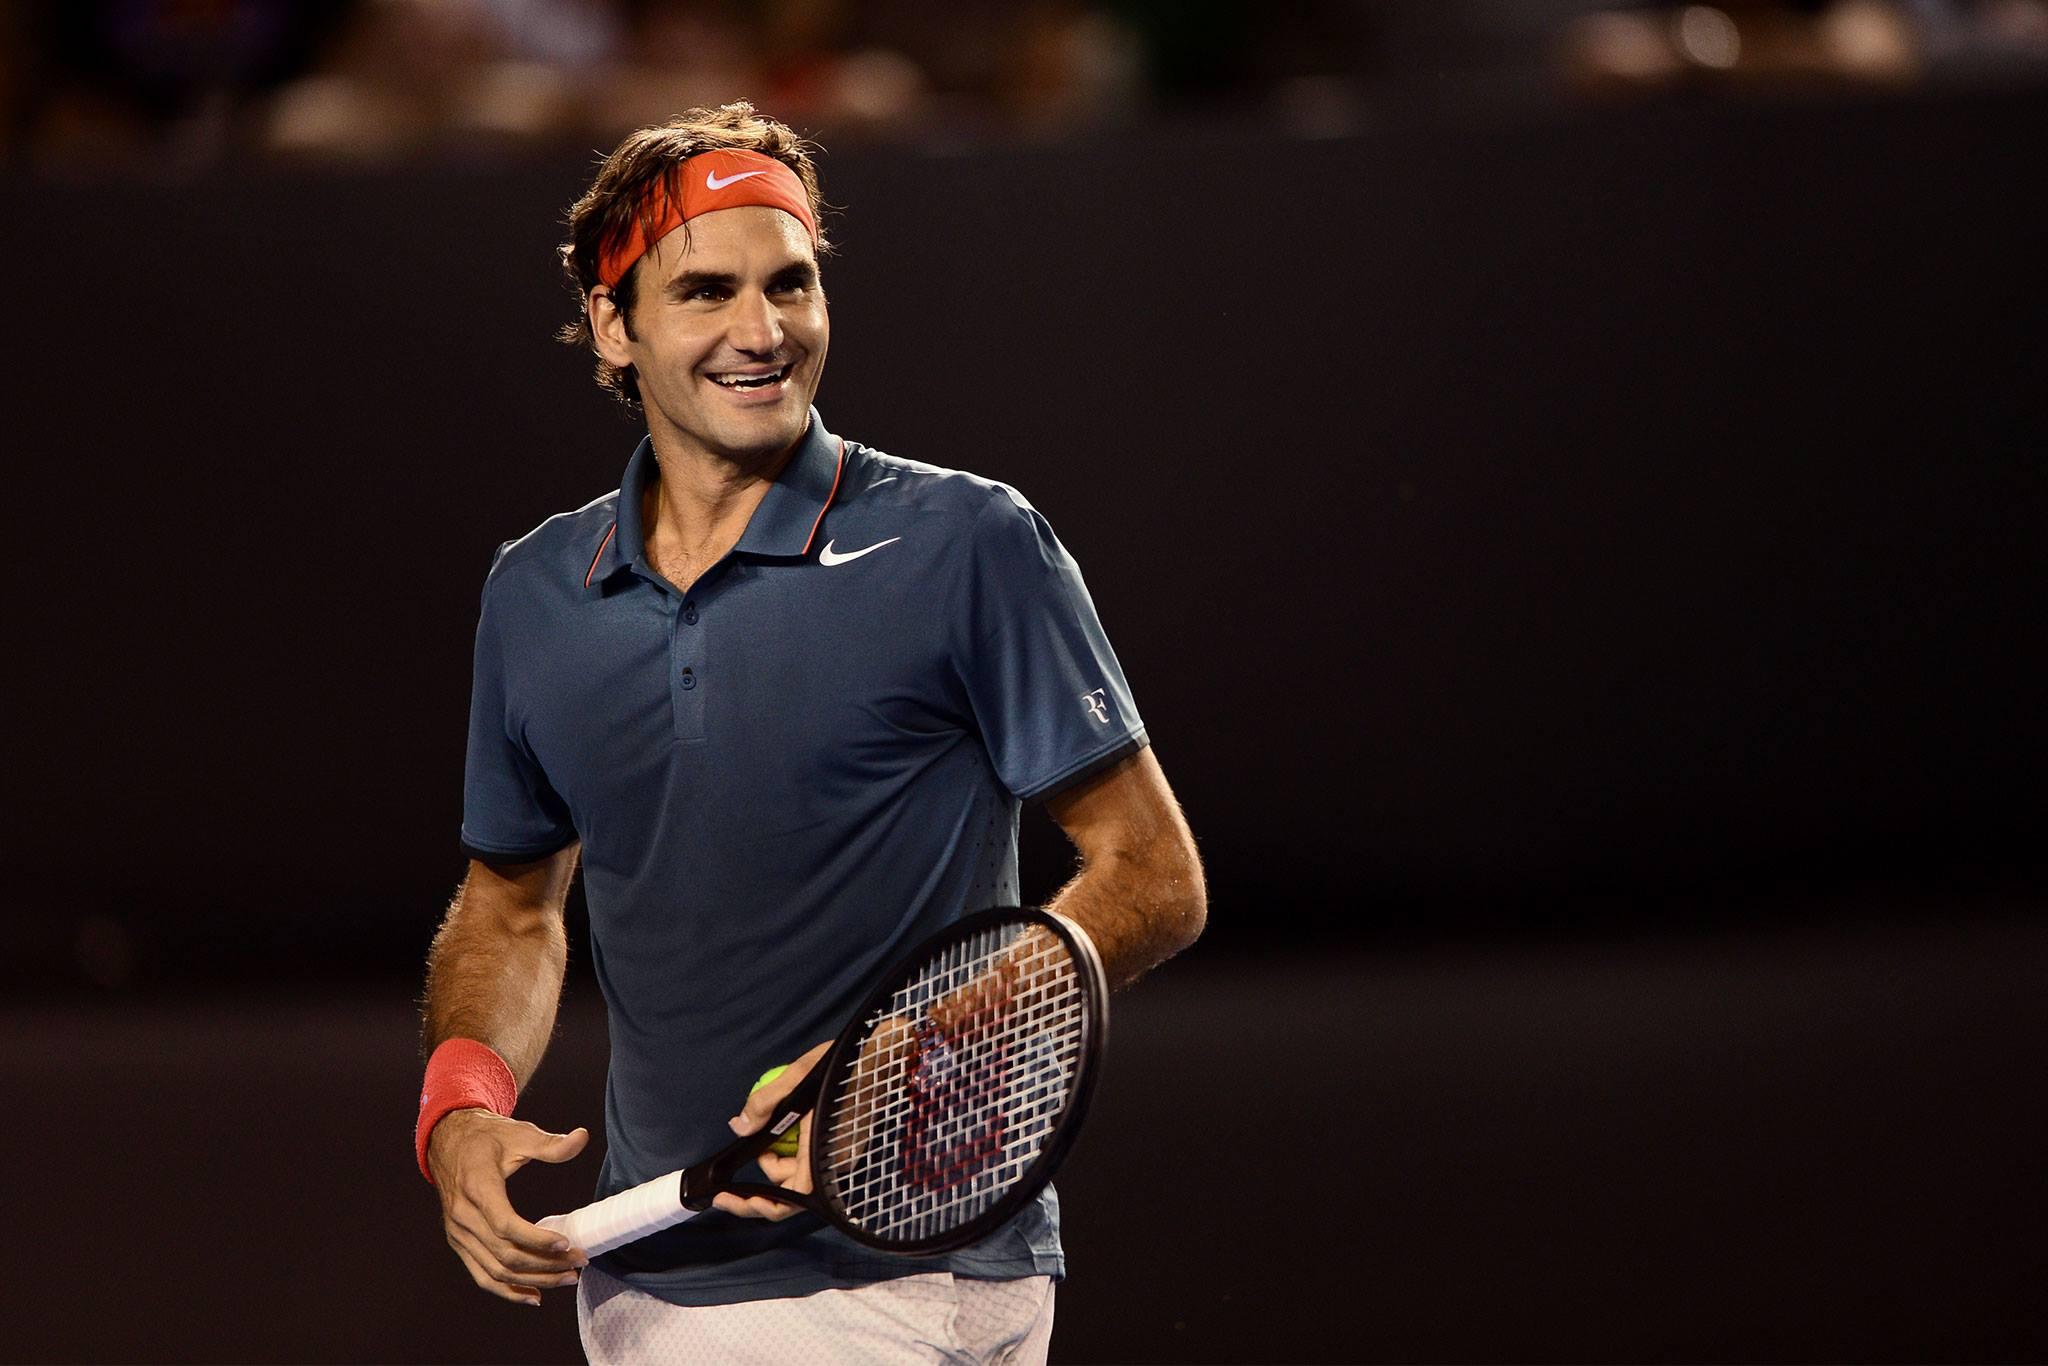 Roger Federer este cel mai titrat jucător de tenis din istorie (rogerfedererfans.com)